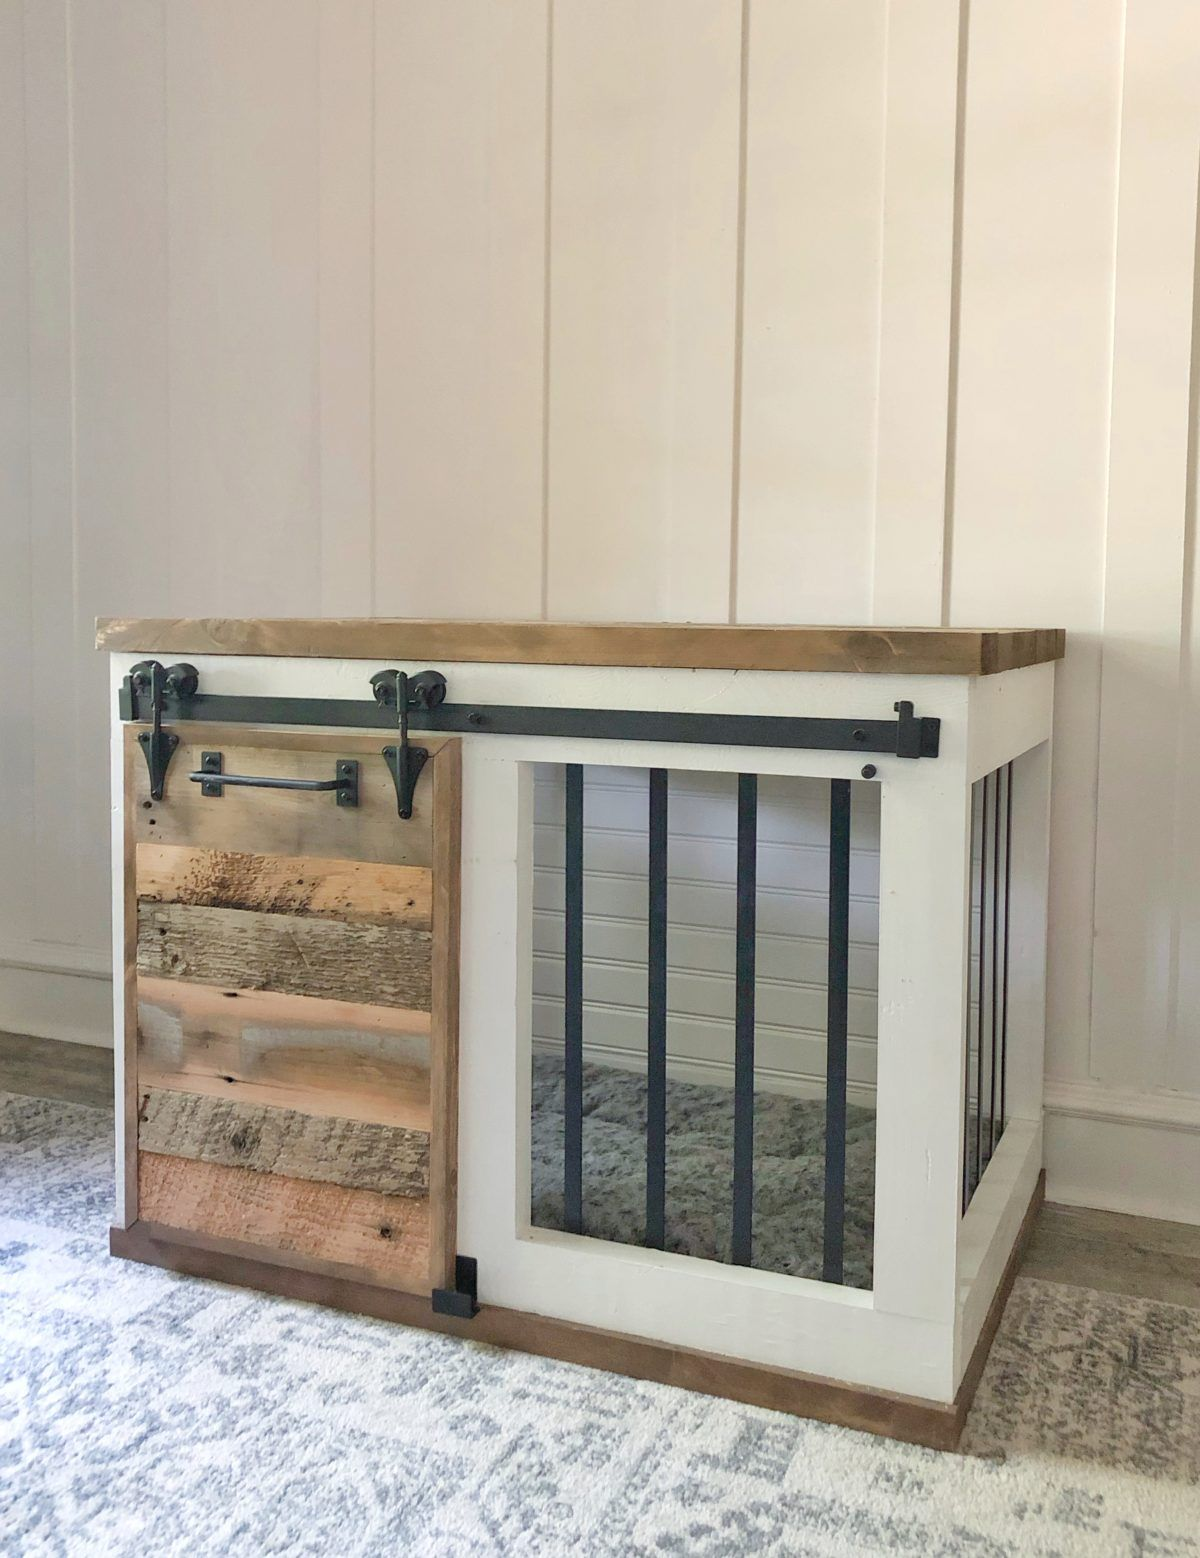 Diy Barn Door Dog Crate Dog Crate Furniture Diy Dog Kennel Diy Dog Crate